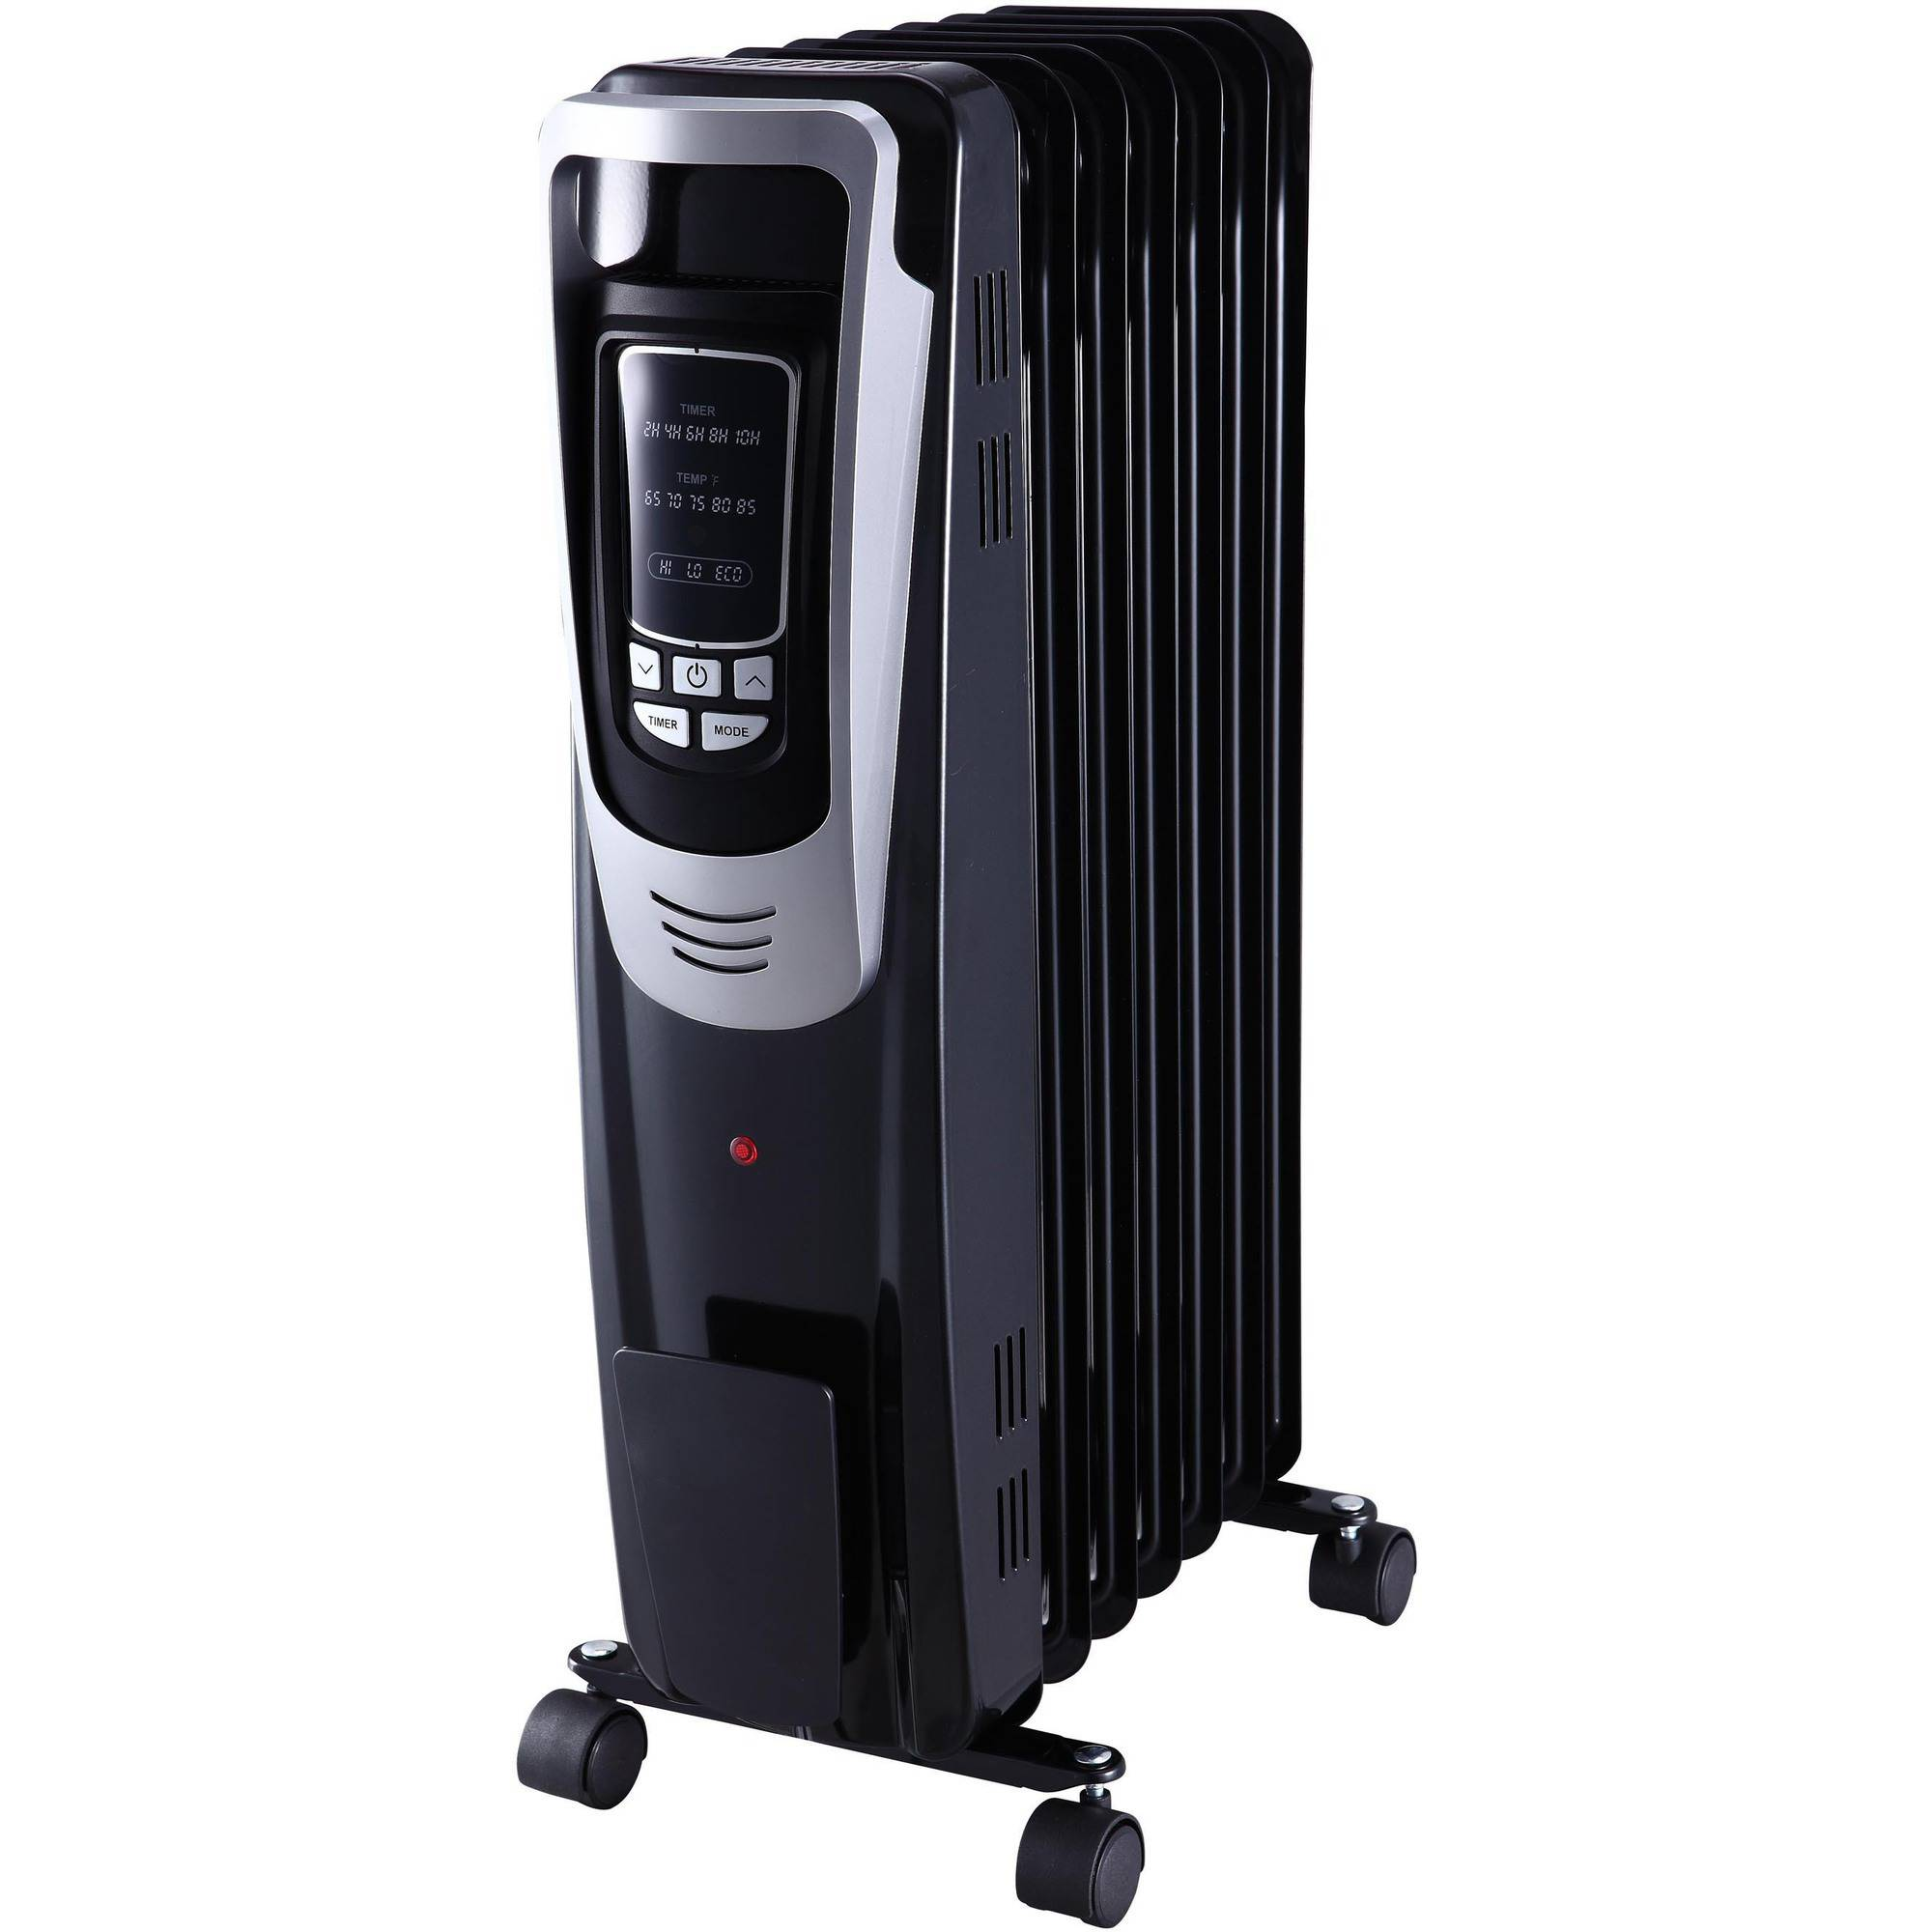 Pelonis Digital Oil Filled Heater, Black